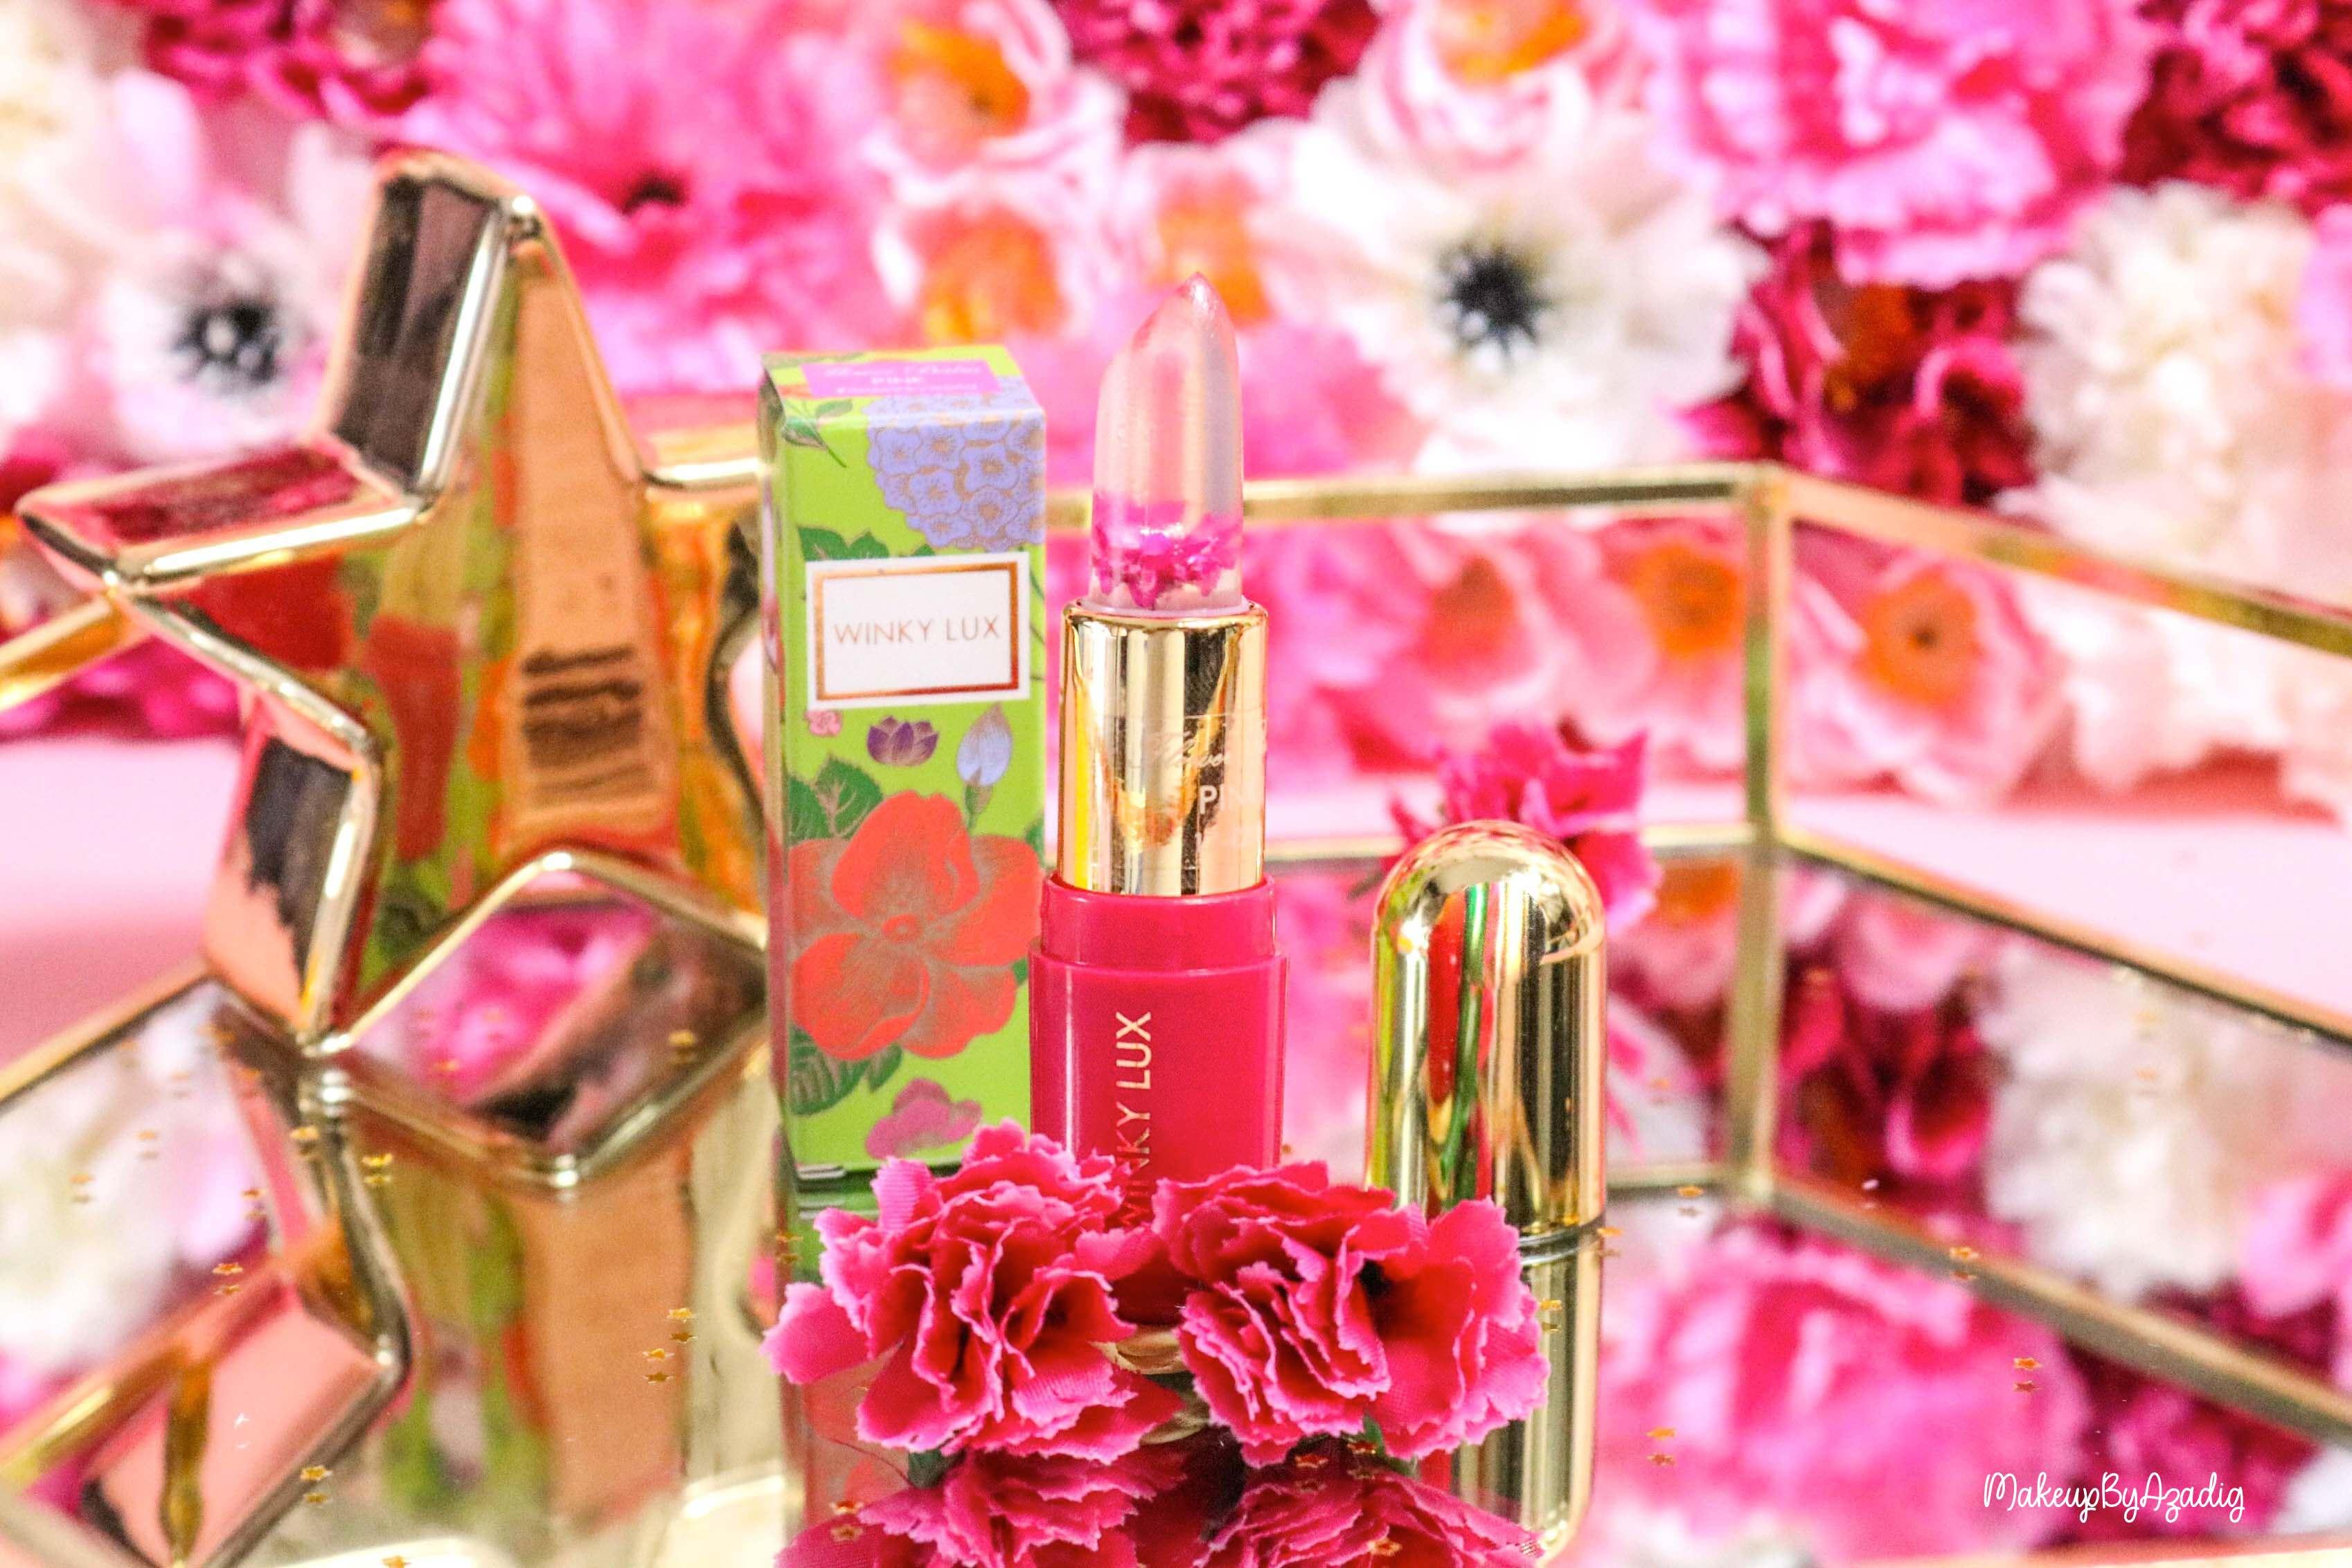 revue-flower-balm-baume-levres-winky-lux-sephora-rose-avis-prix-makeupbyazadig-miniature